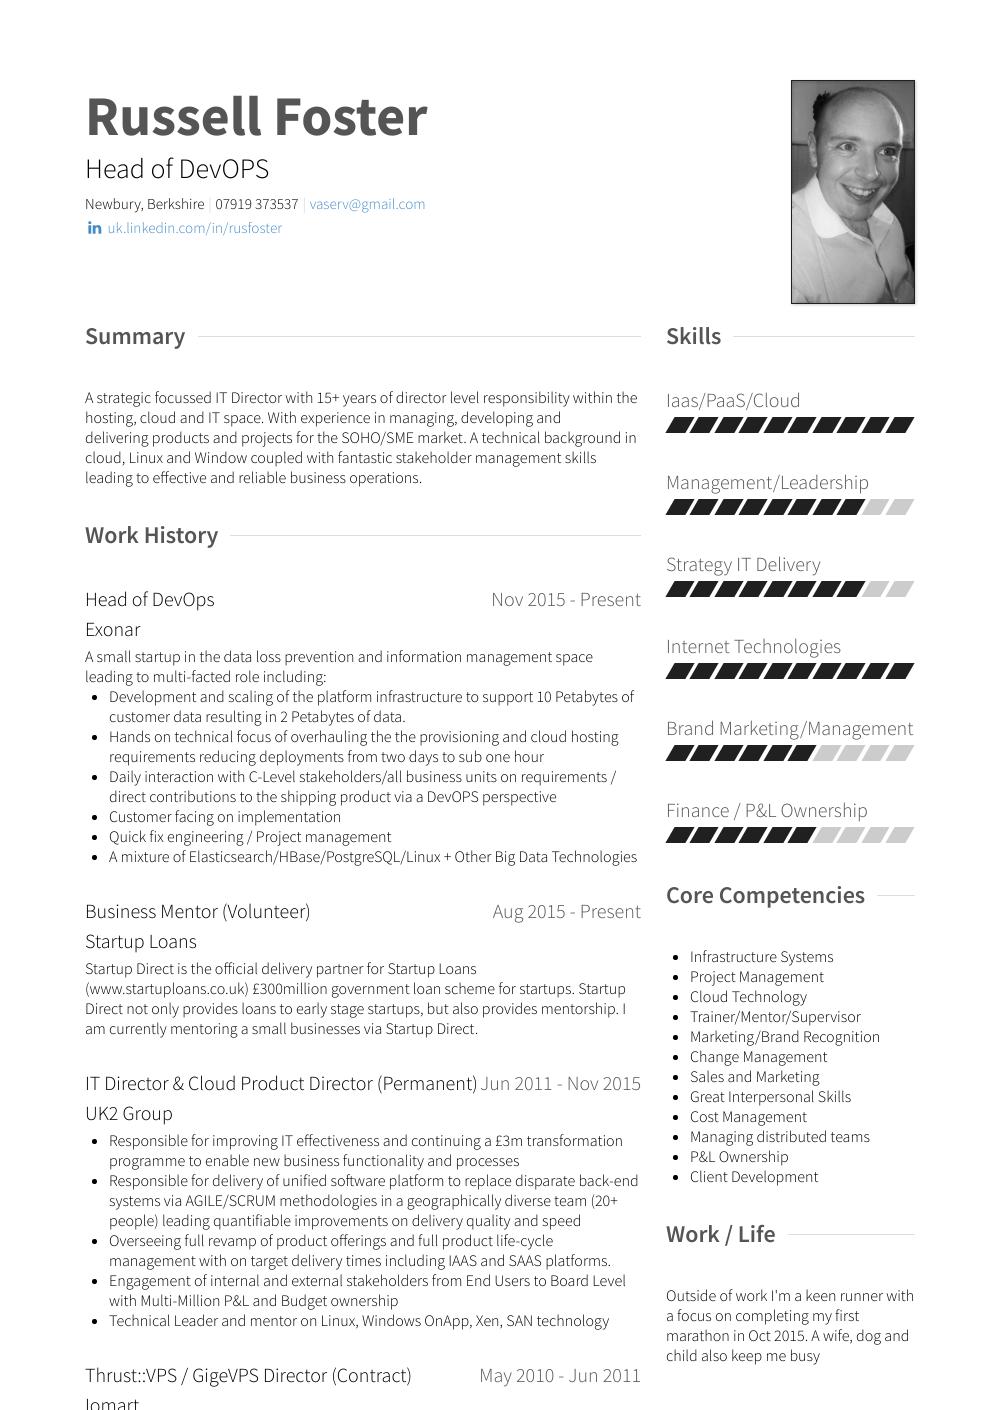 resume with volunteer experience